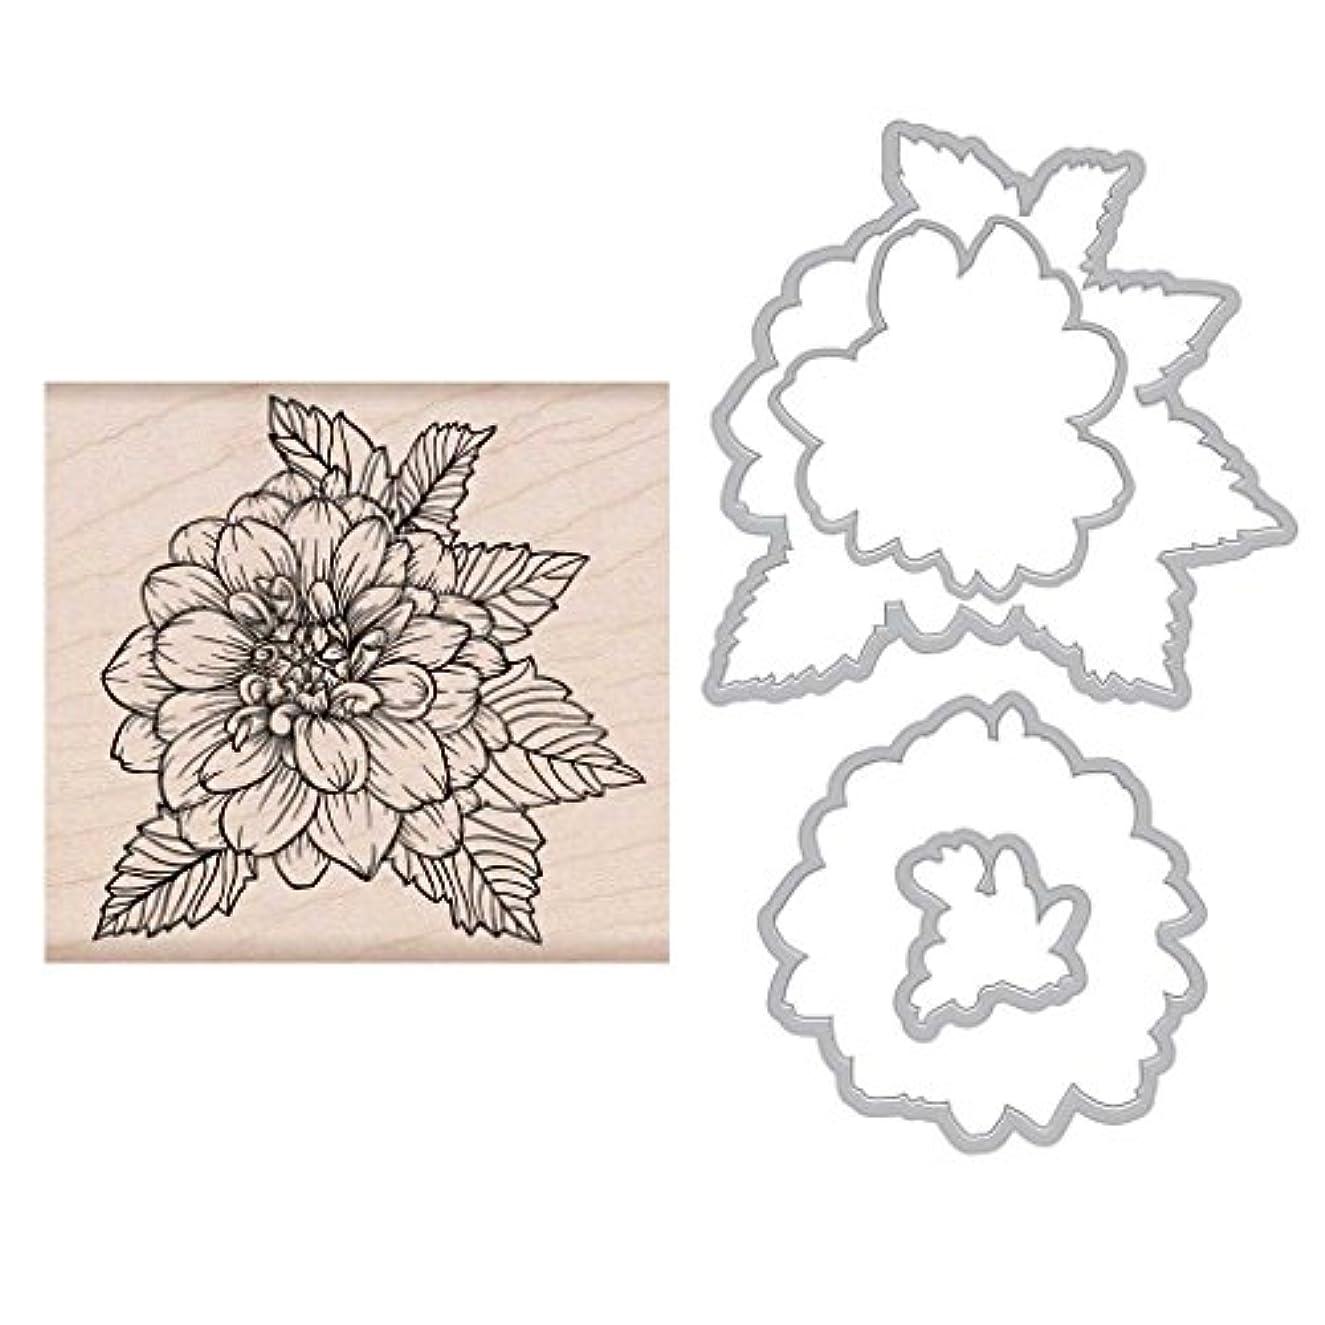 Hero Arts Artistic Dahlia Wood Mounted Stamp & Die Combo (SB154)